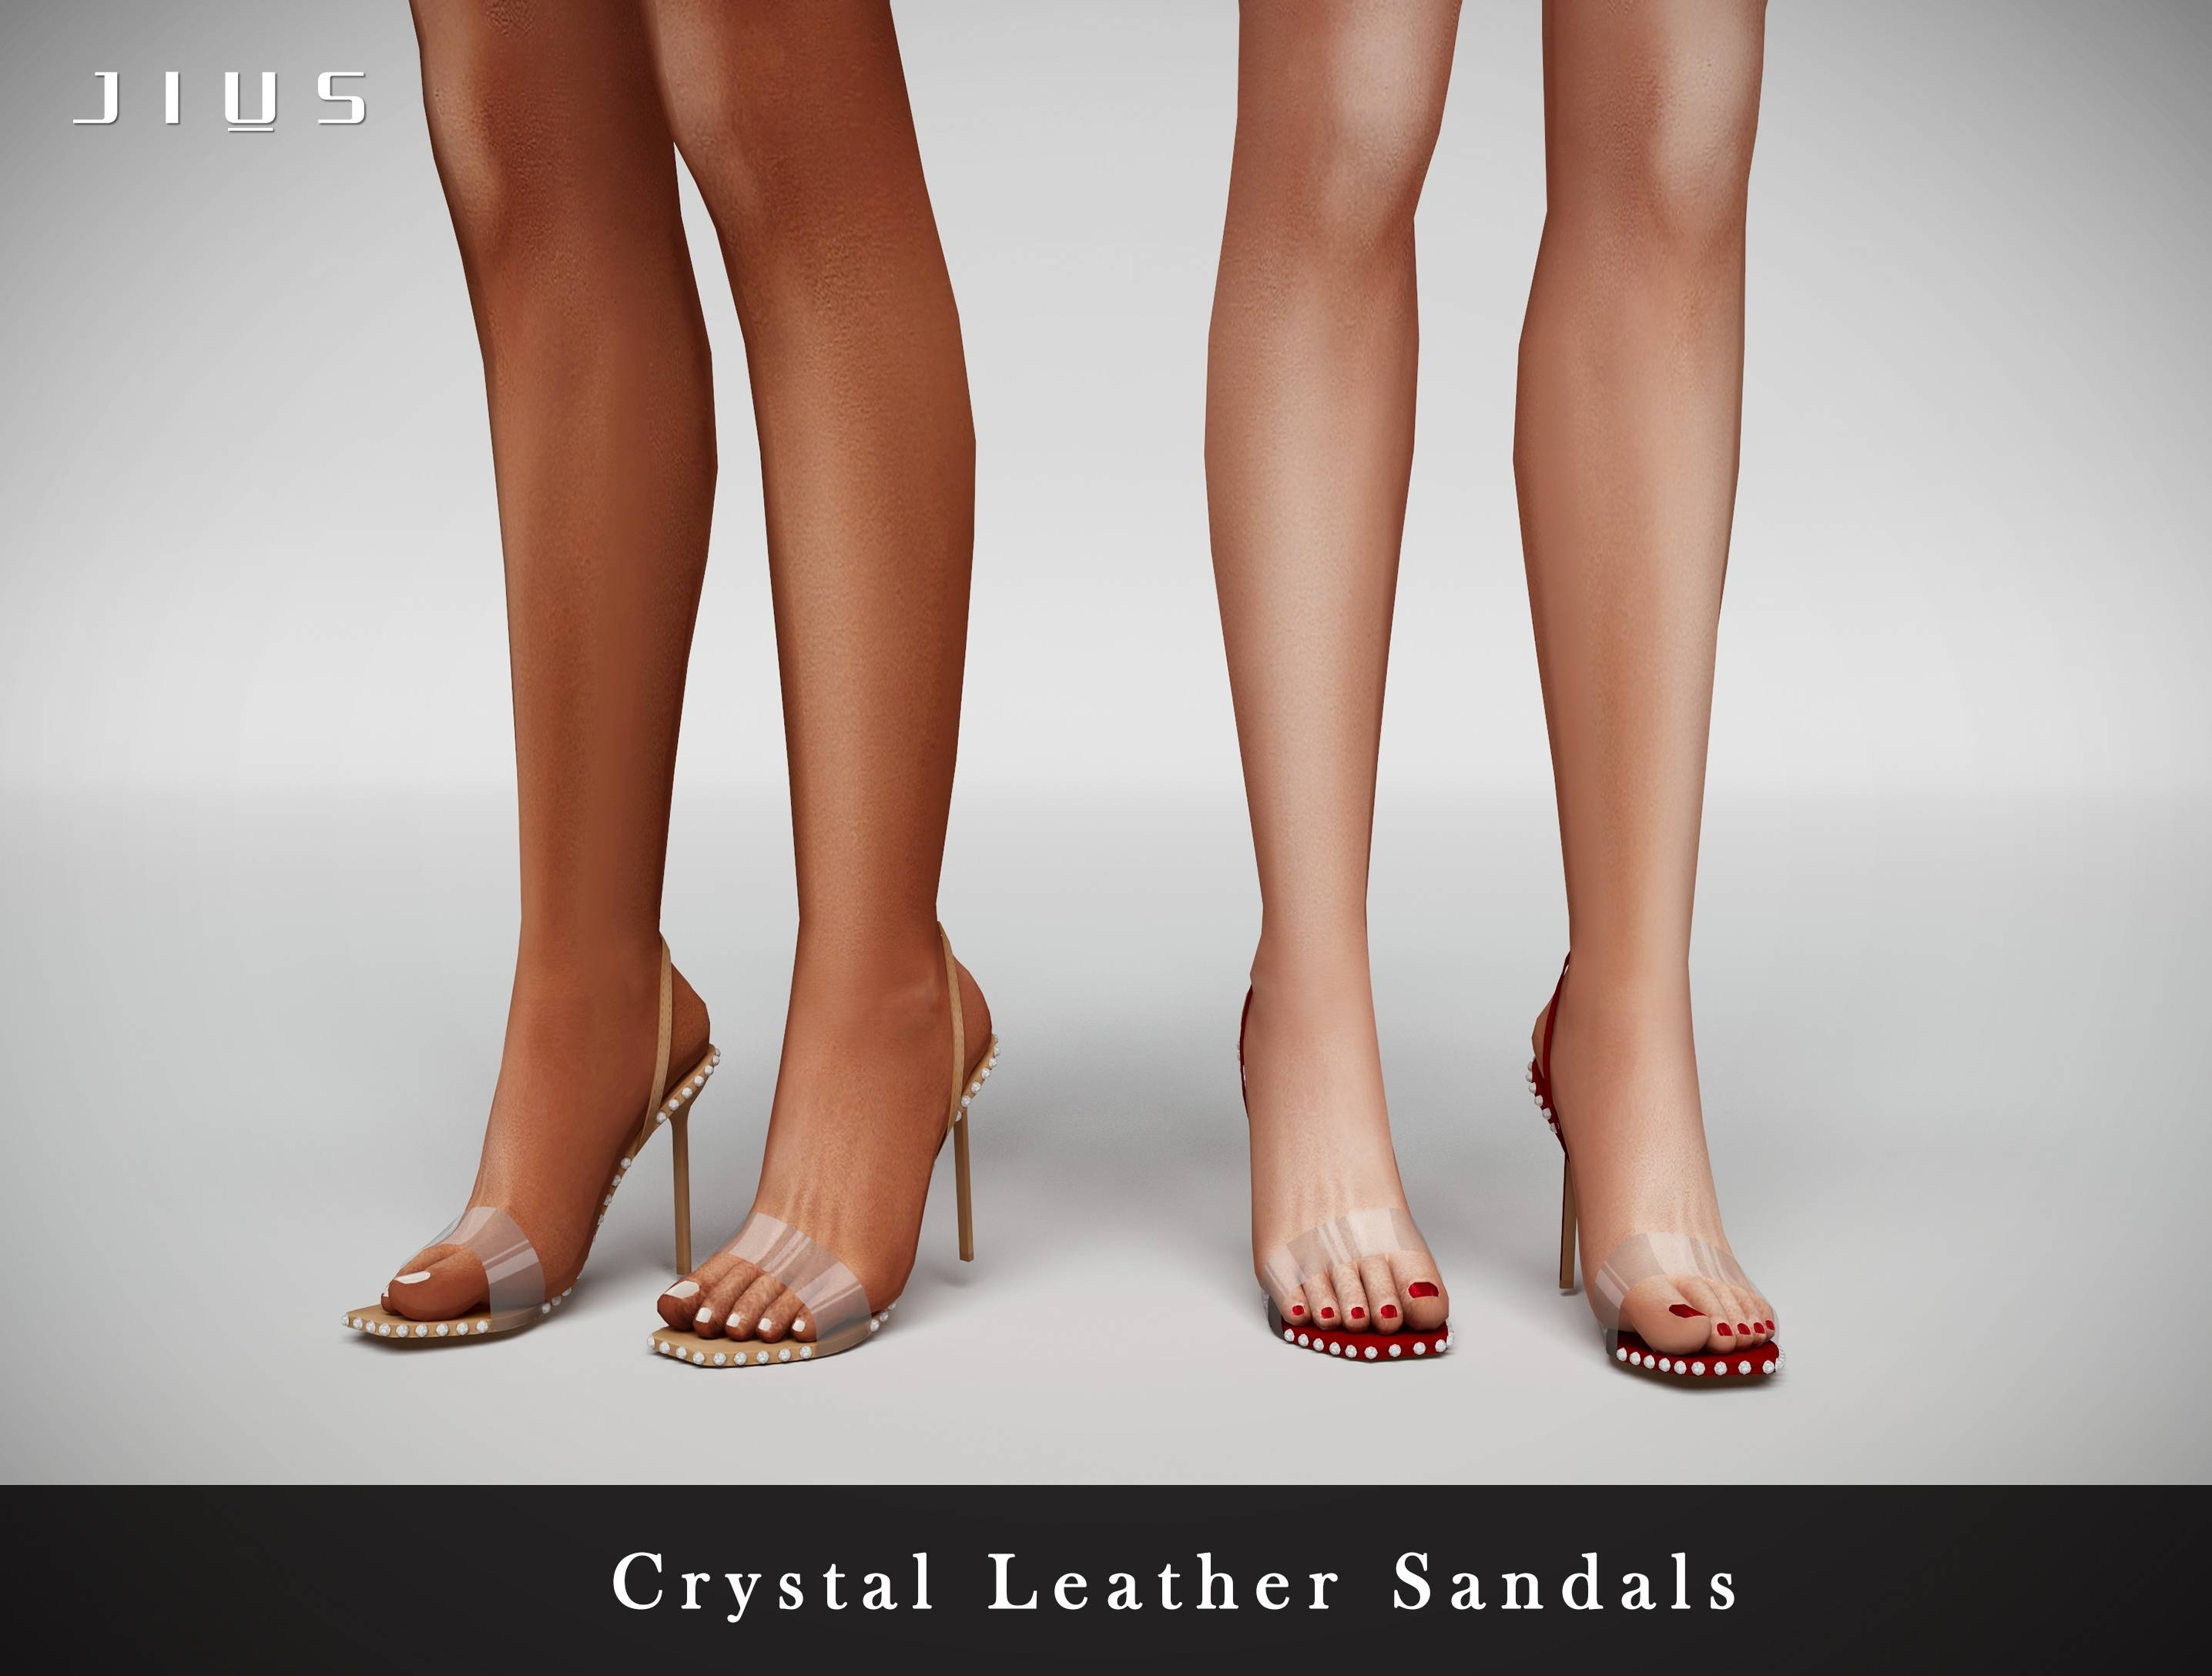 Босоножки - Crystal Leather Sandals 01